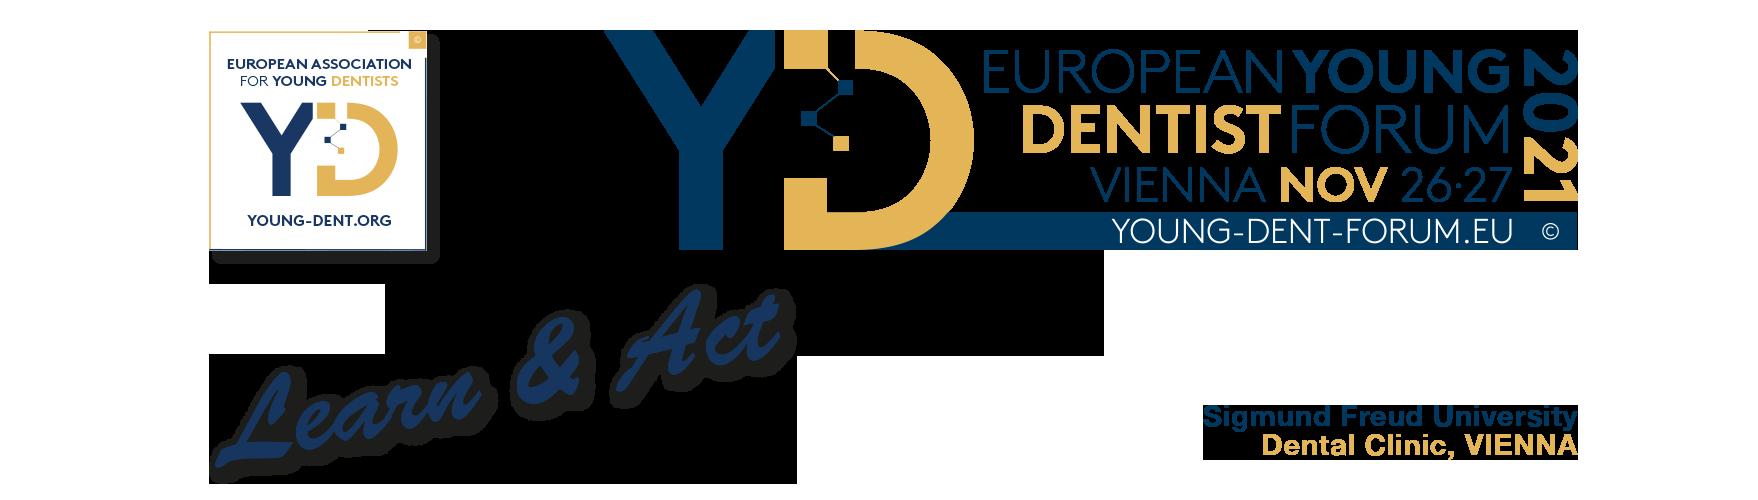 EUROPEAN YOUNG DENTIST FORUM